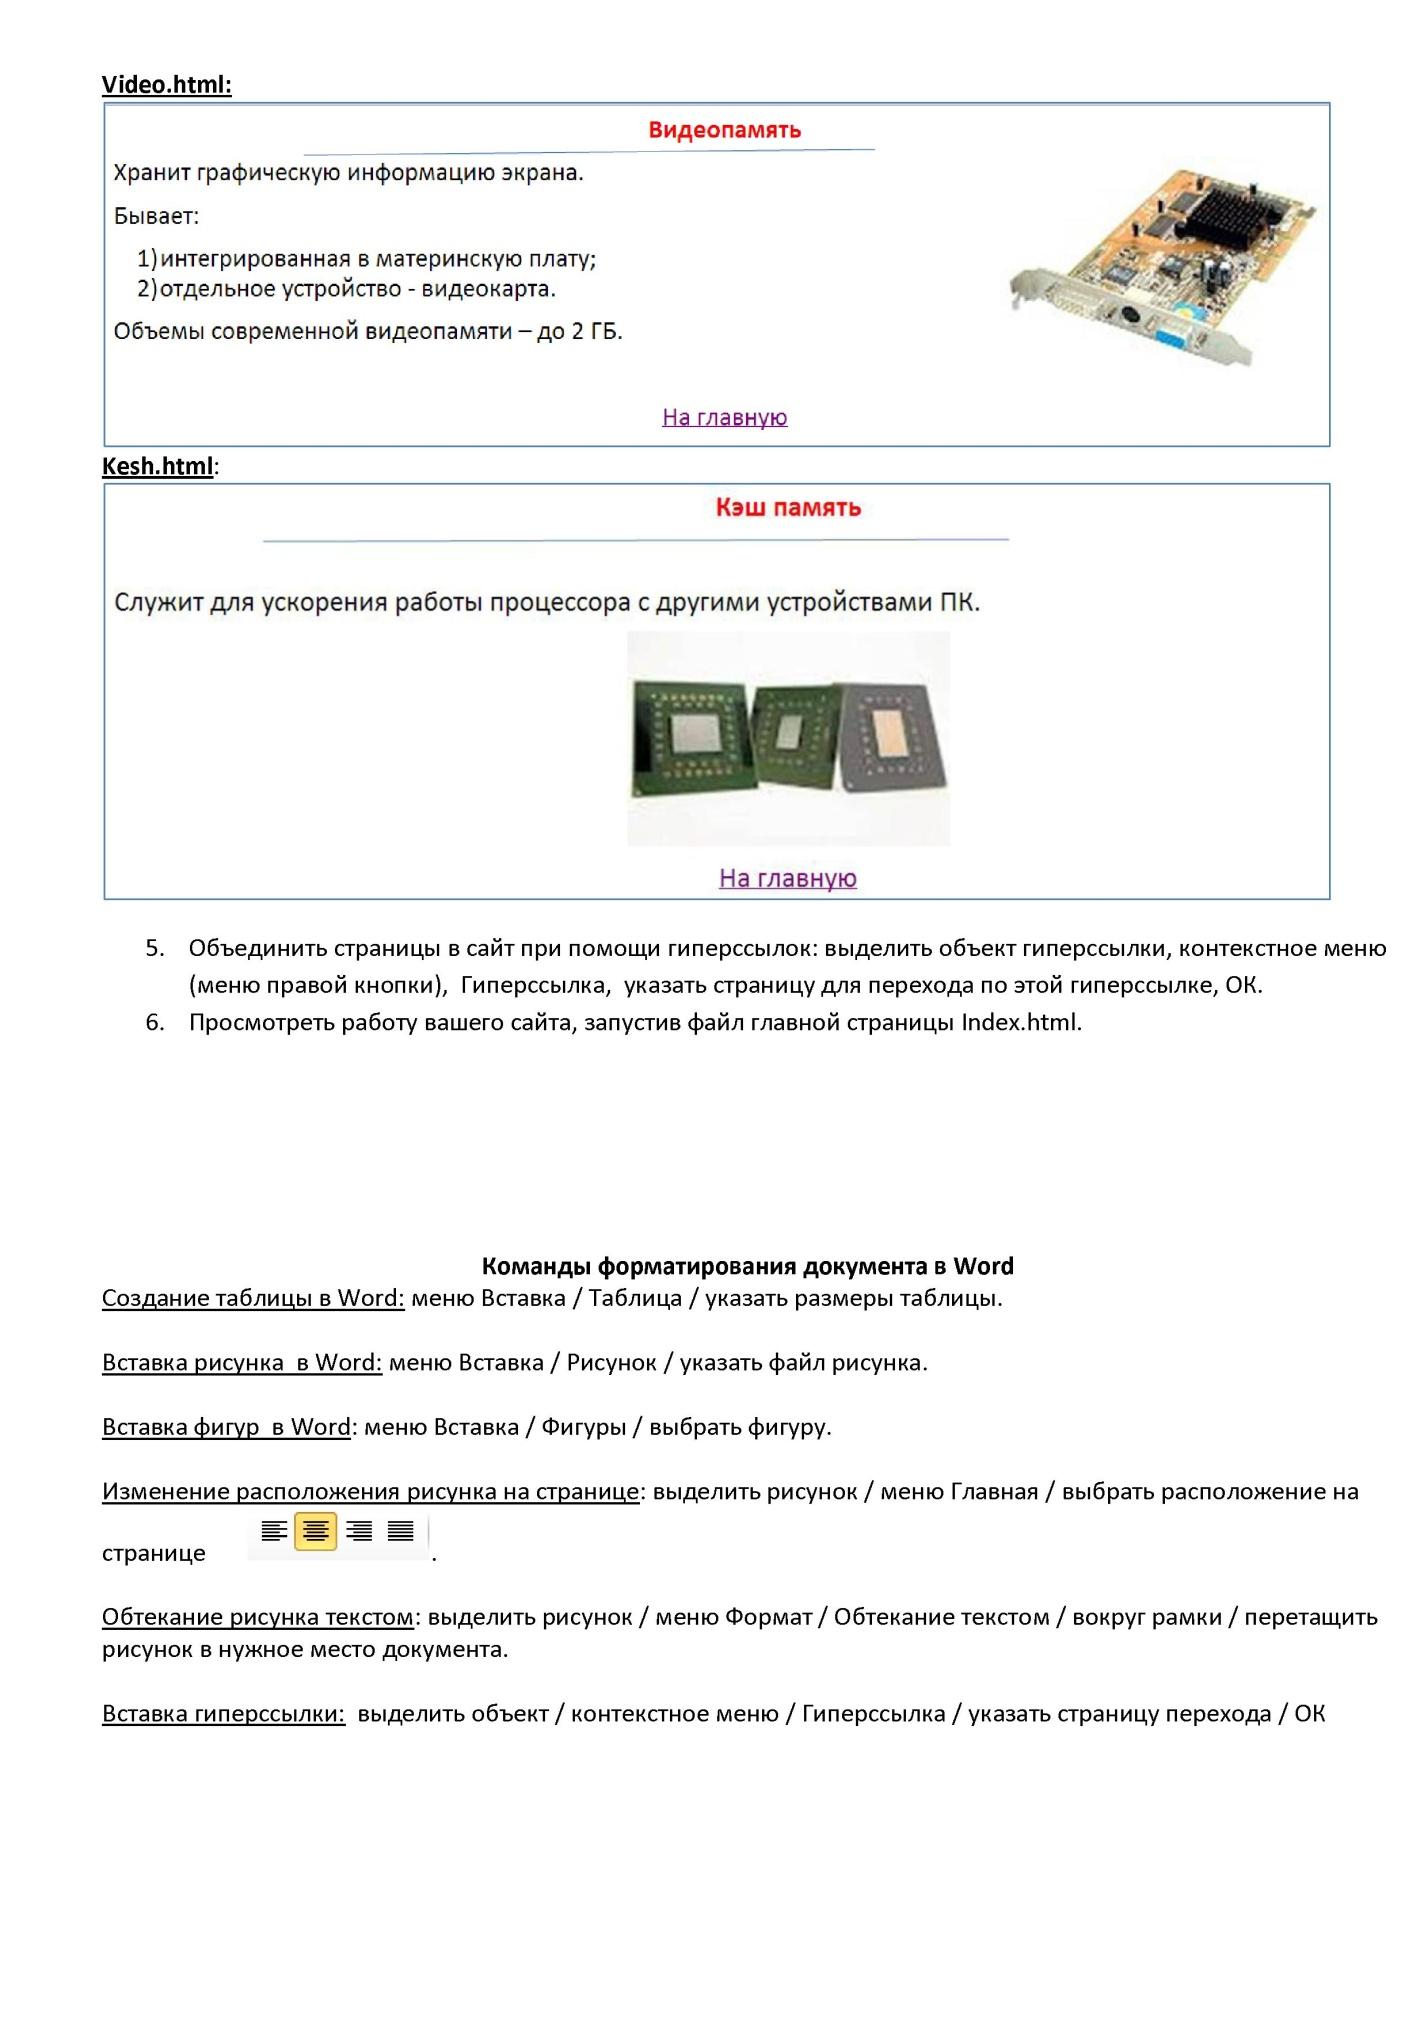 C:\Users\Фарида\Desktop\аттестация 2016\Создание сайта с помощью Word - 0002.jpg